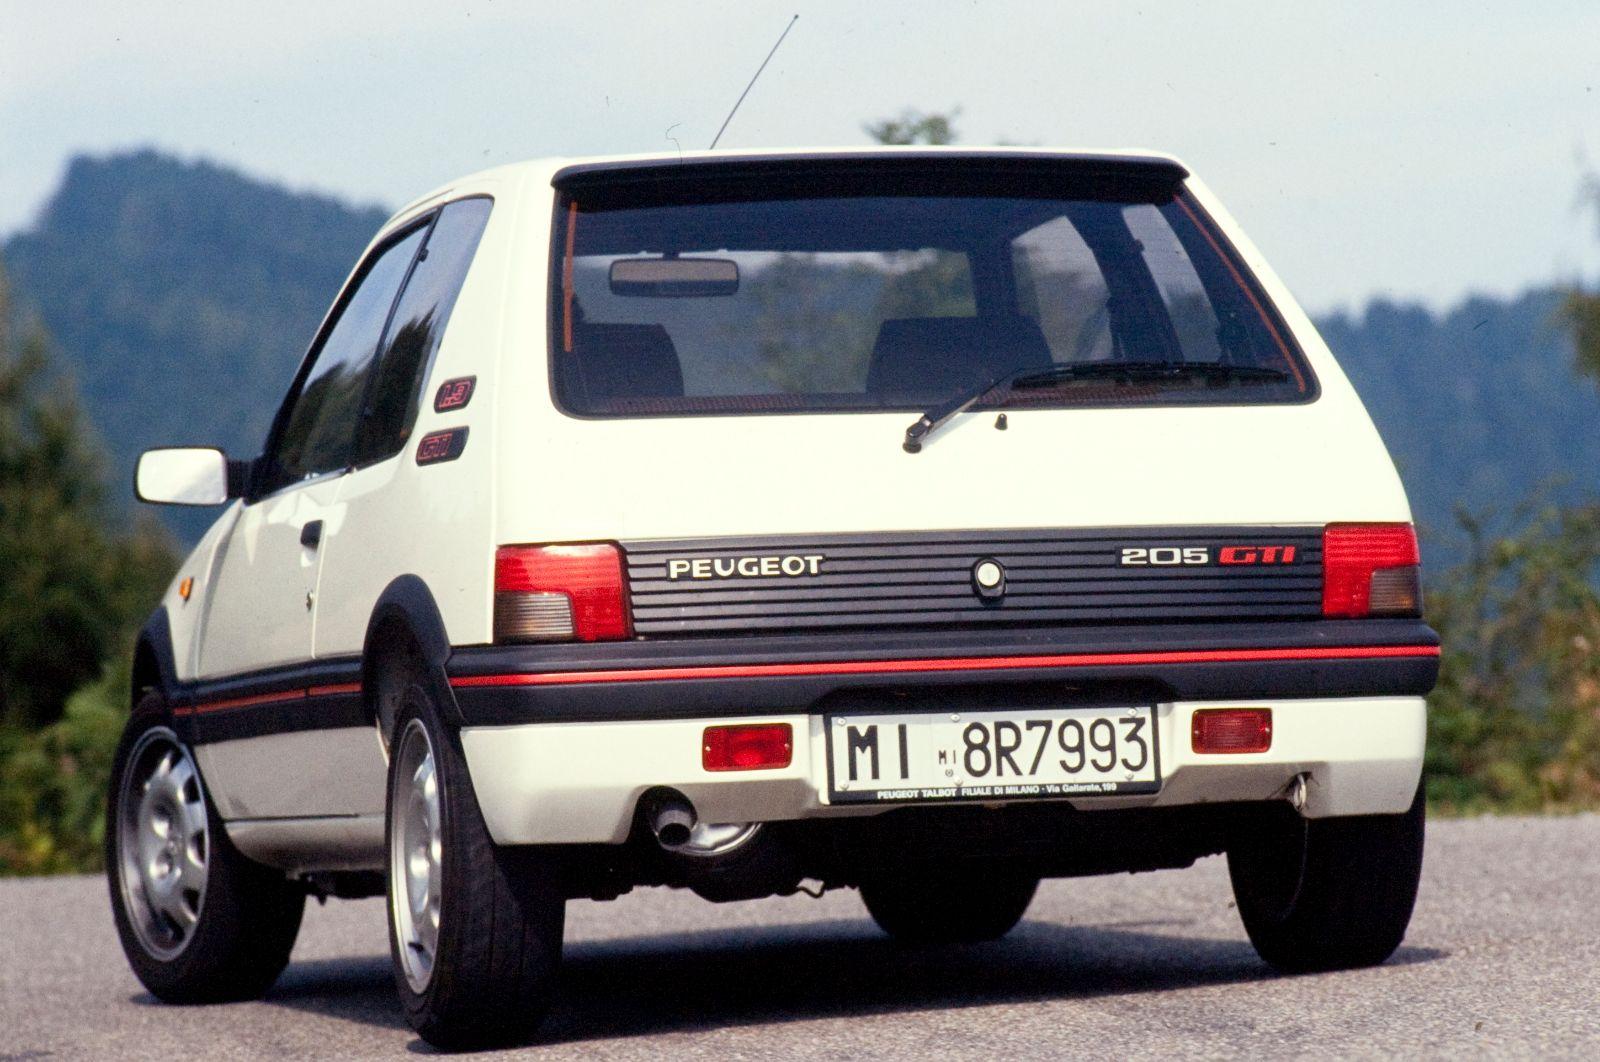 peugeot-205-gti-1-9-1990-3